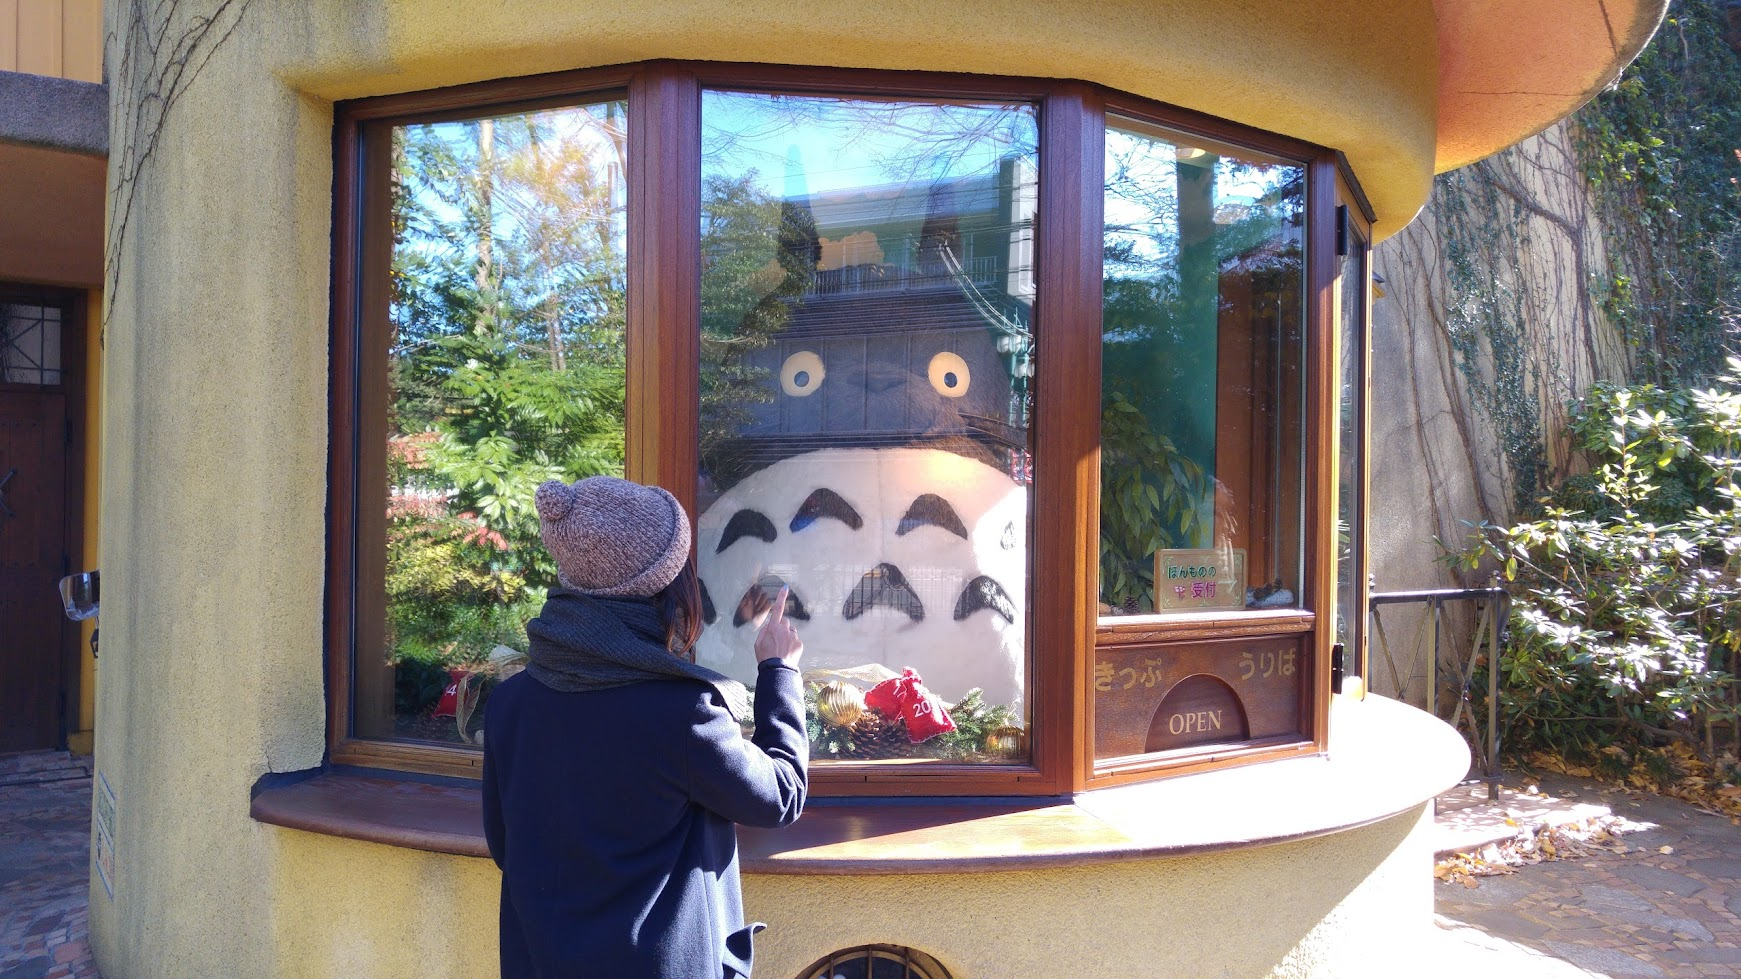 Studio Ghibli Museum >> A Visit To The Studio Ghibli Museum Mitaka Japan 2016